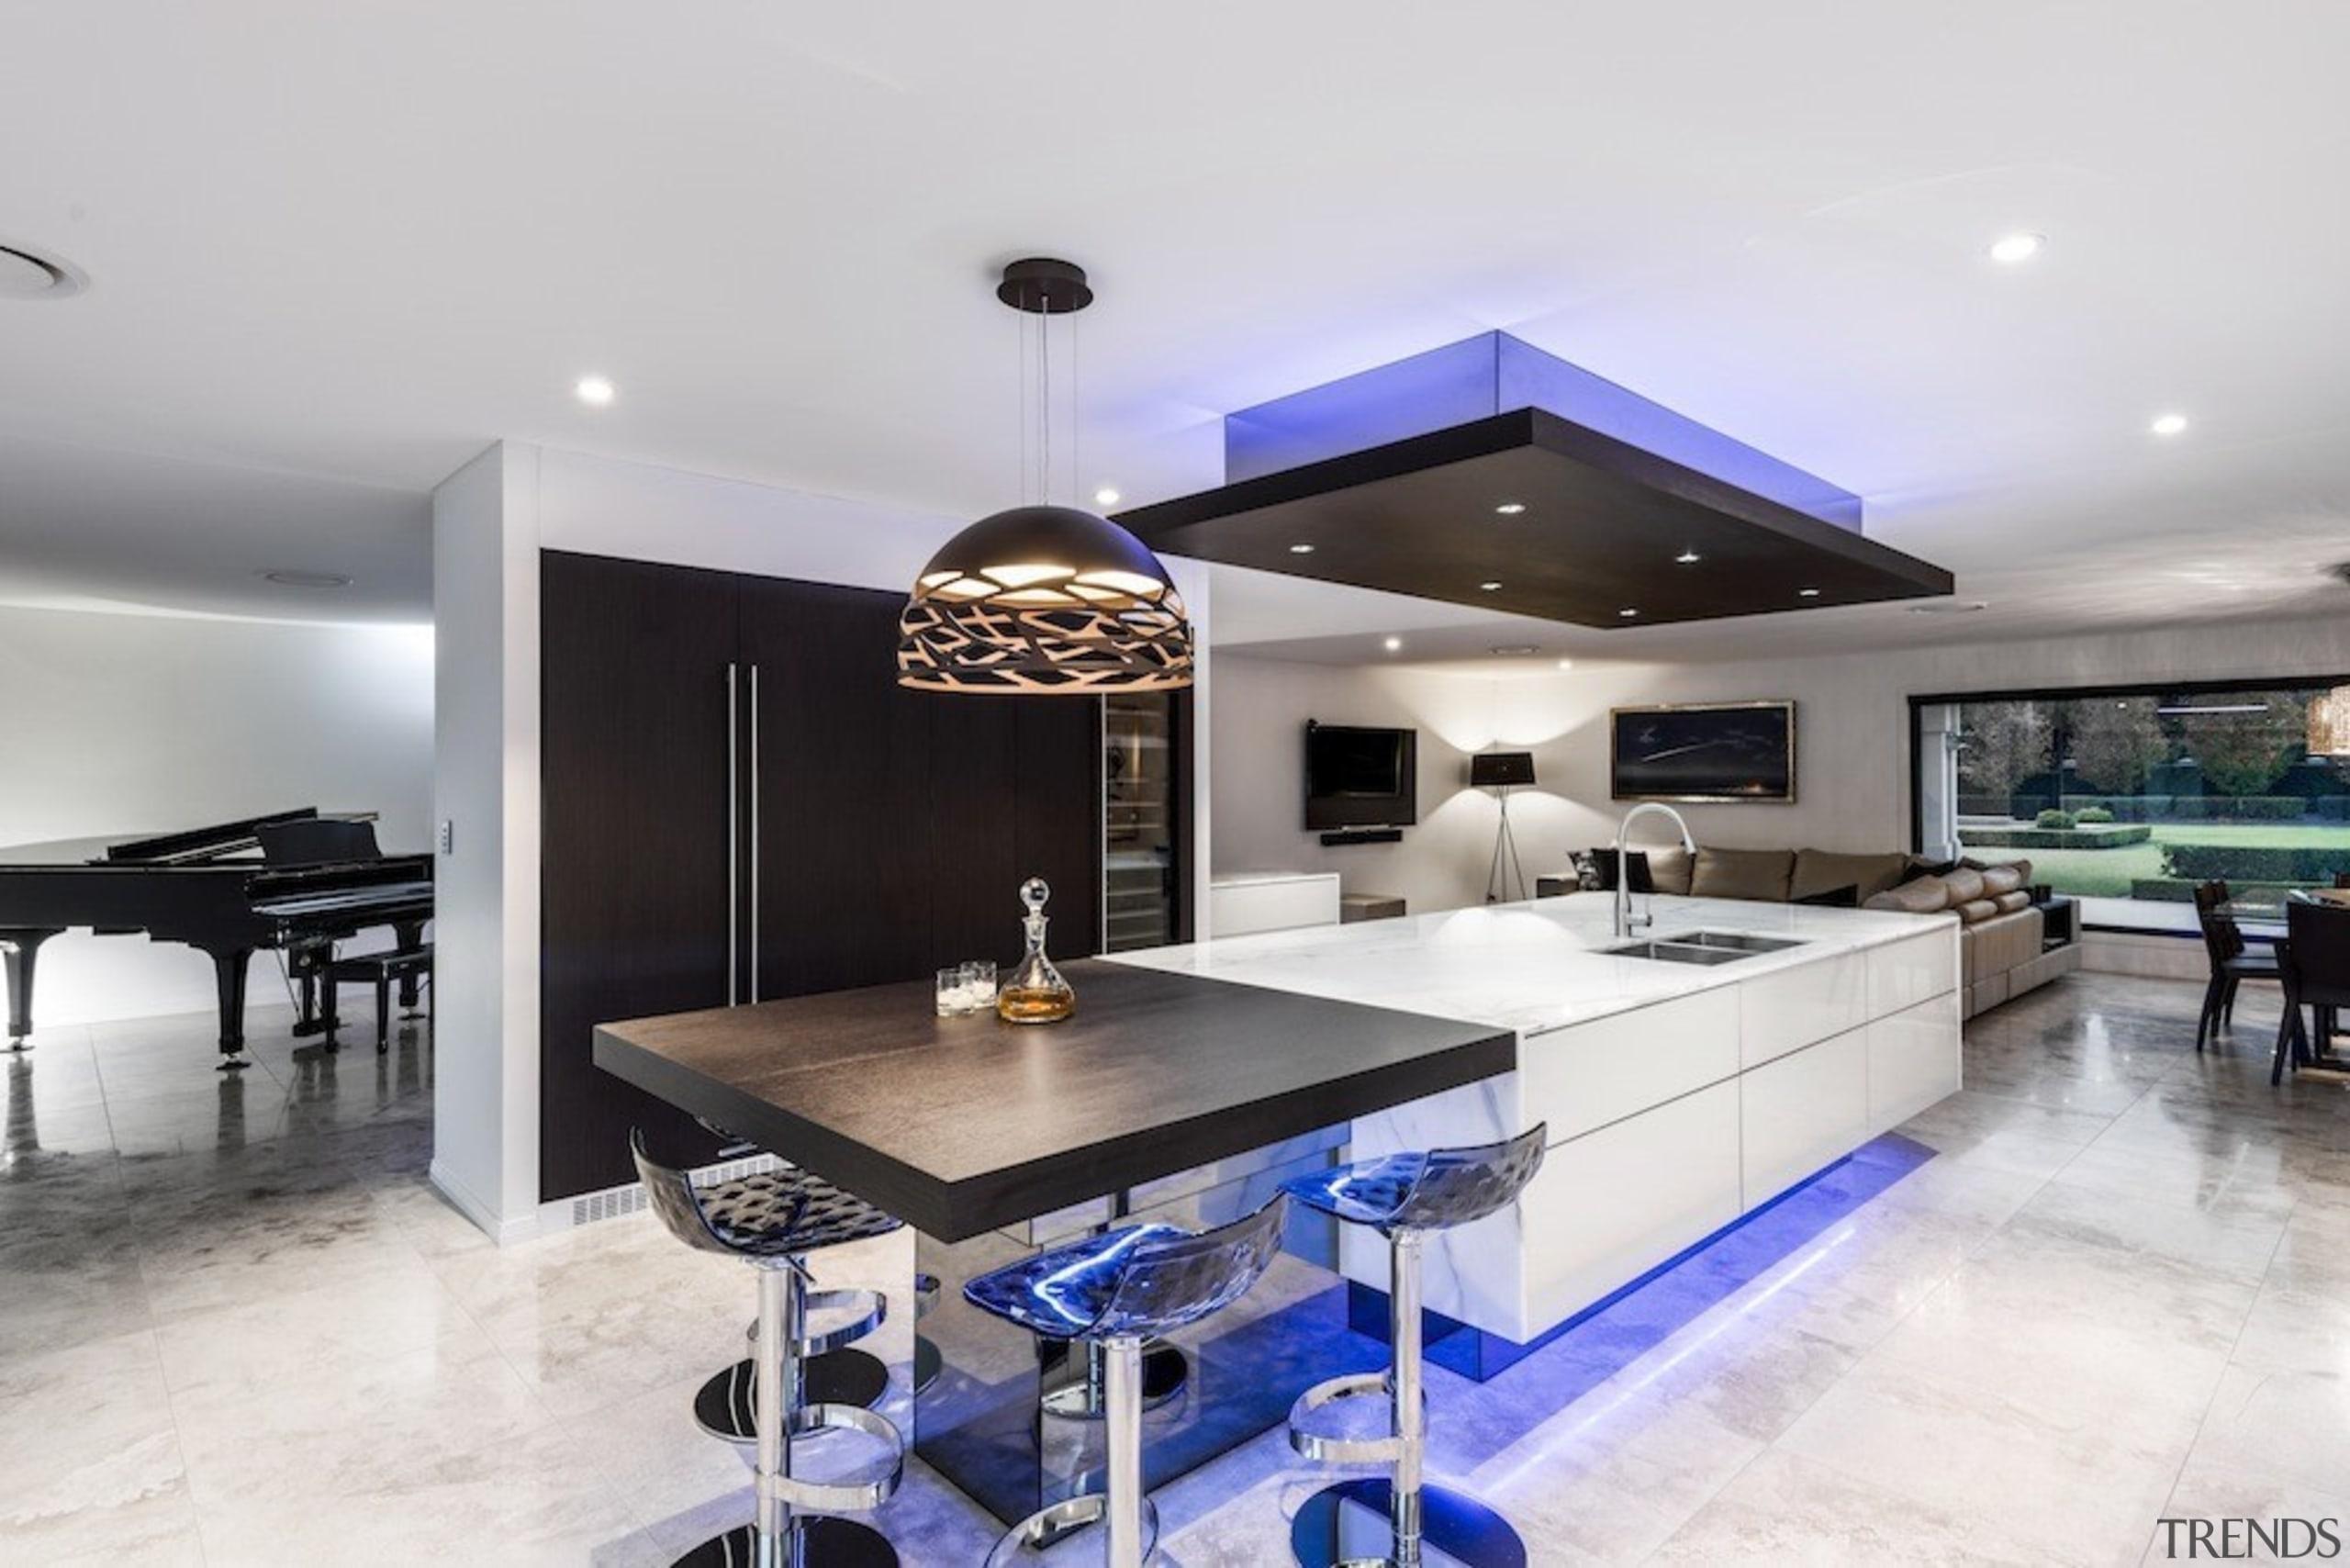 A focus on lighting – Kitchen by designer countertop, interior design, kitchen, property, real estate, white, gray